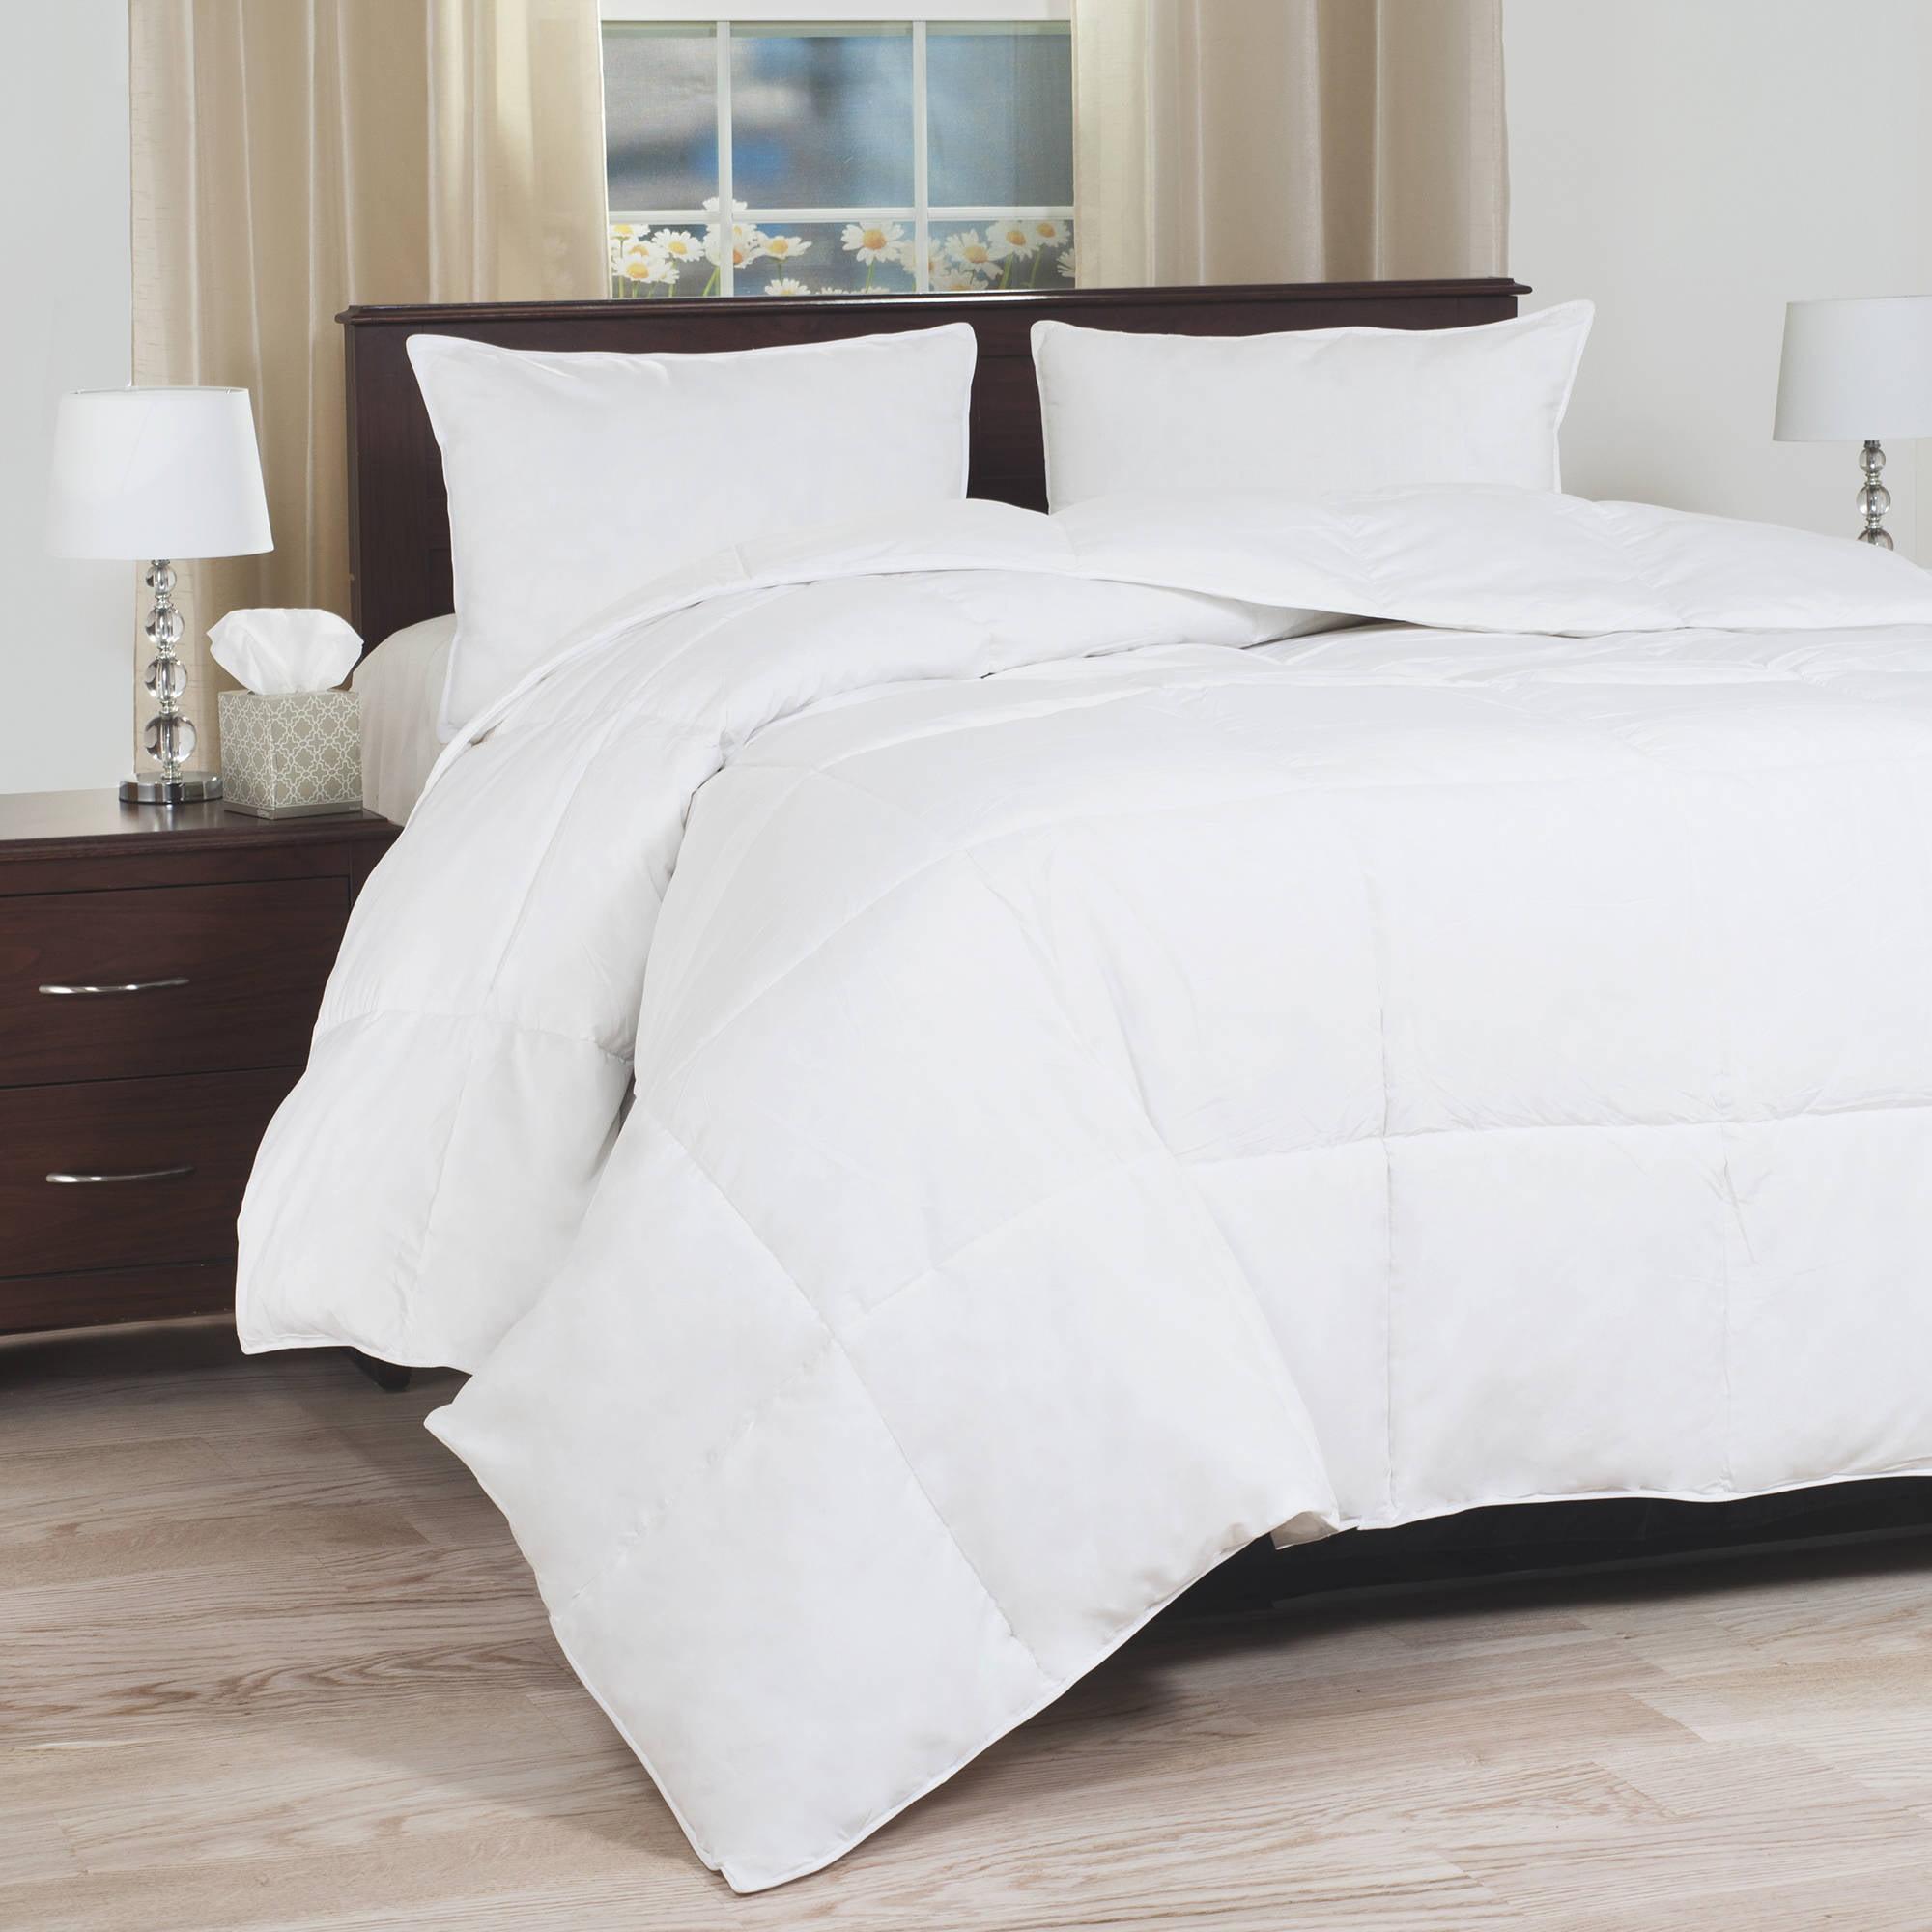 Somerset Home Down Blend Overfilled Bedding Comforter